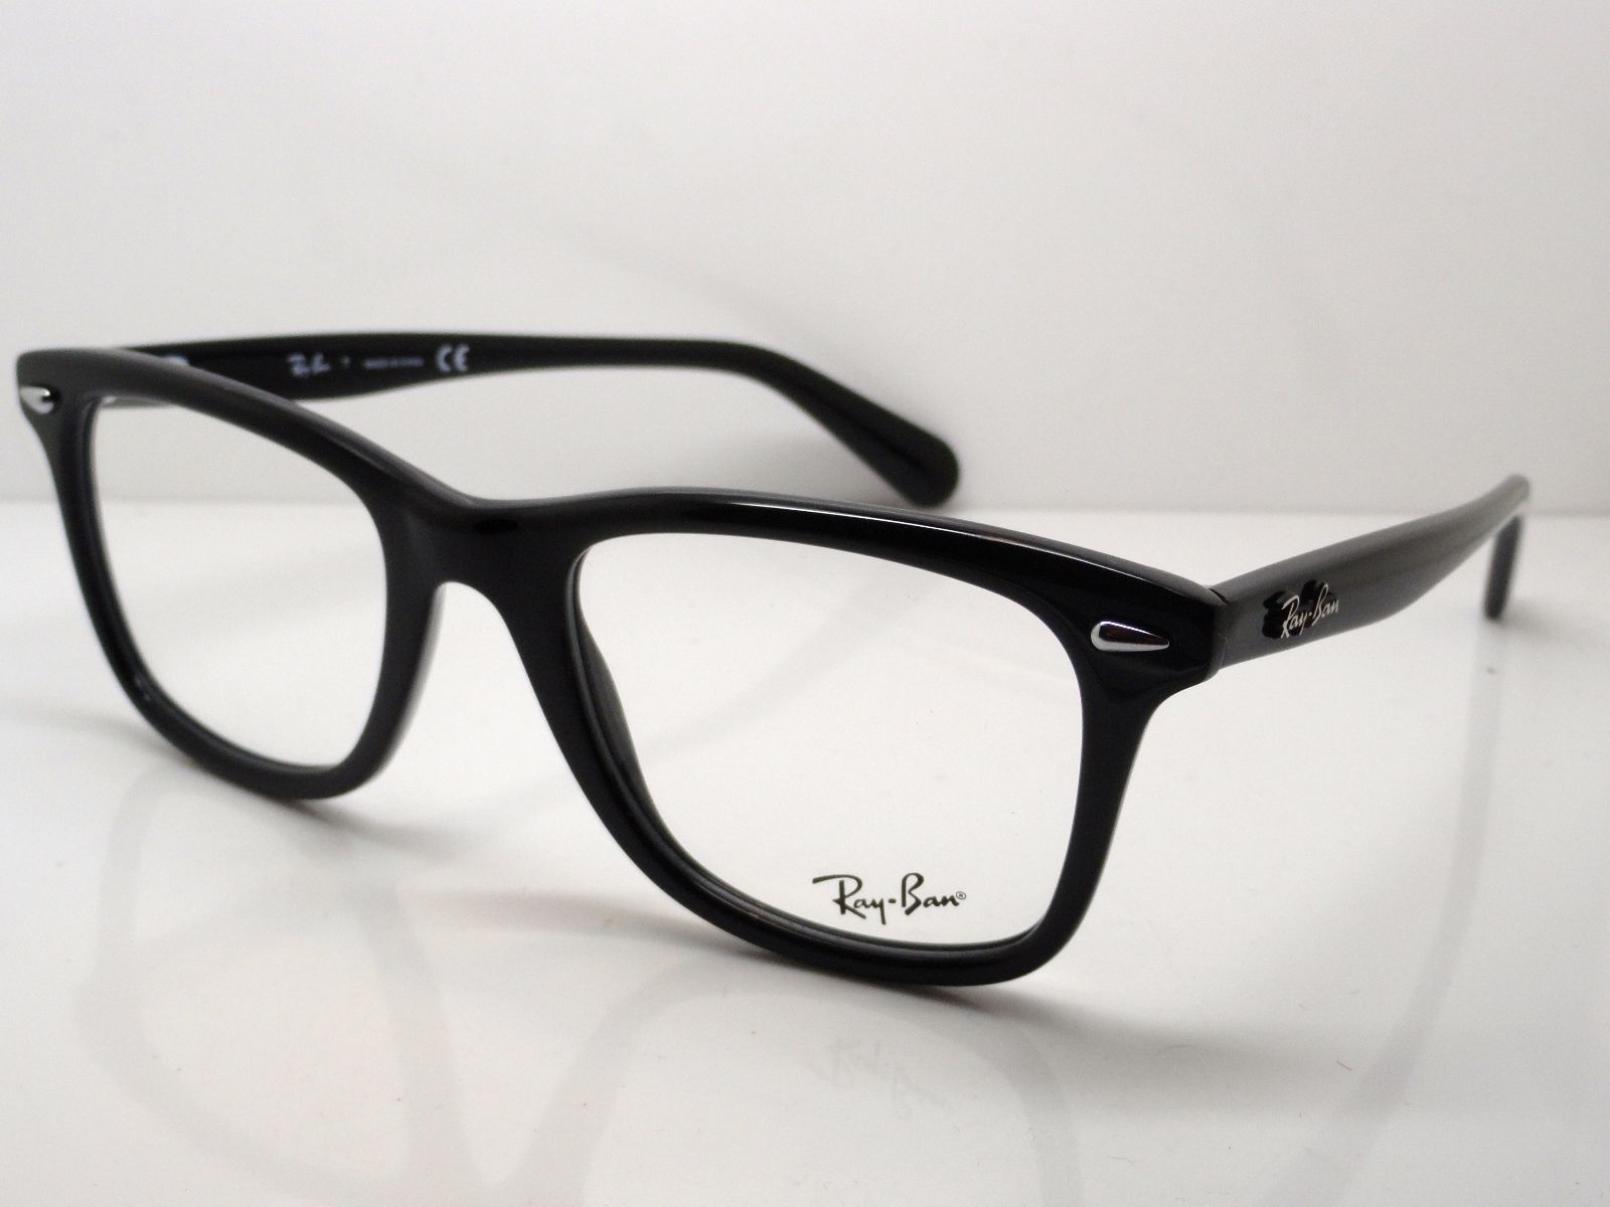 00ca324f099da Prescription Ray Bans Eyeglasses 5317 « Heritage Malta